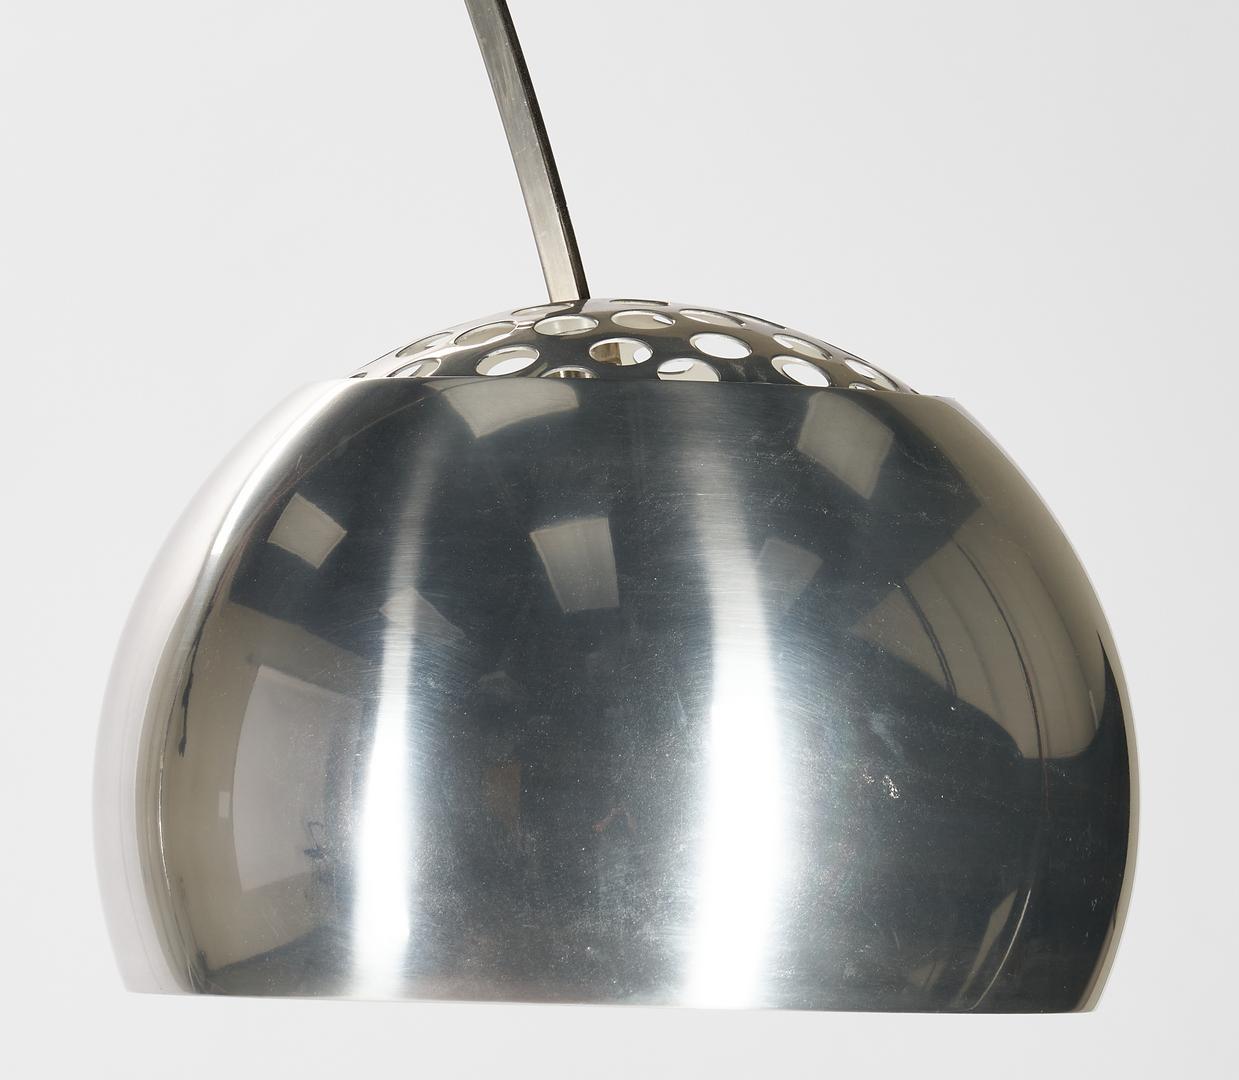 Lot 607: Italian Castiglioni Arco Floor Lamp w/ Marble Base, Mid-century